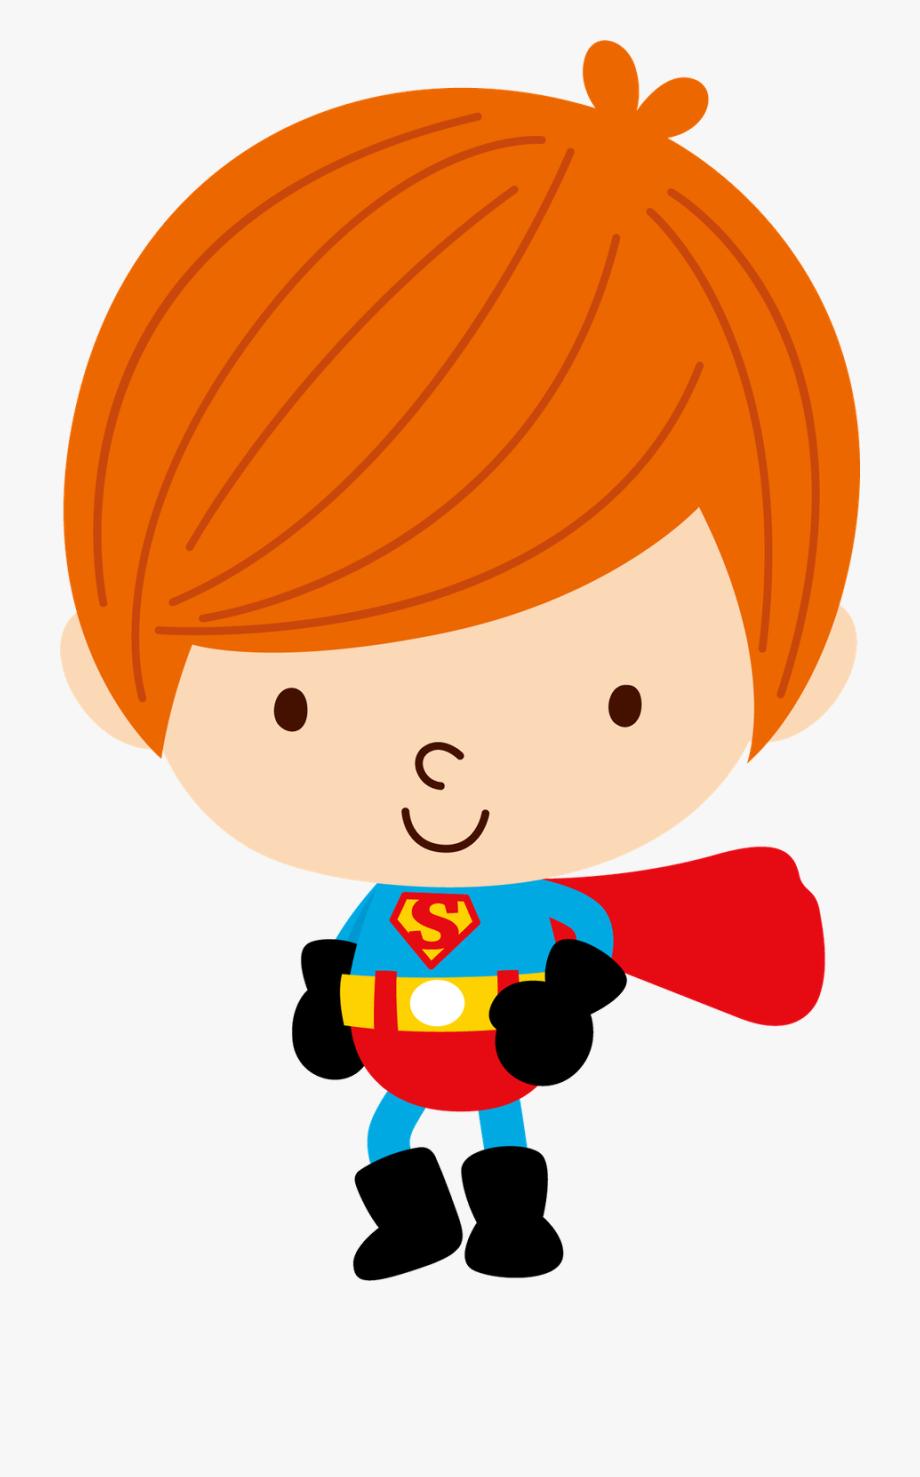 Super Her Is Minus Alreadyclipart Hero S.